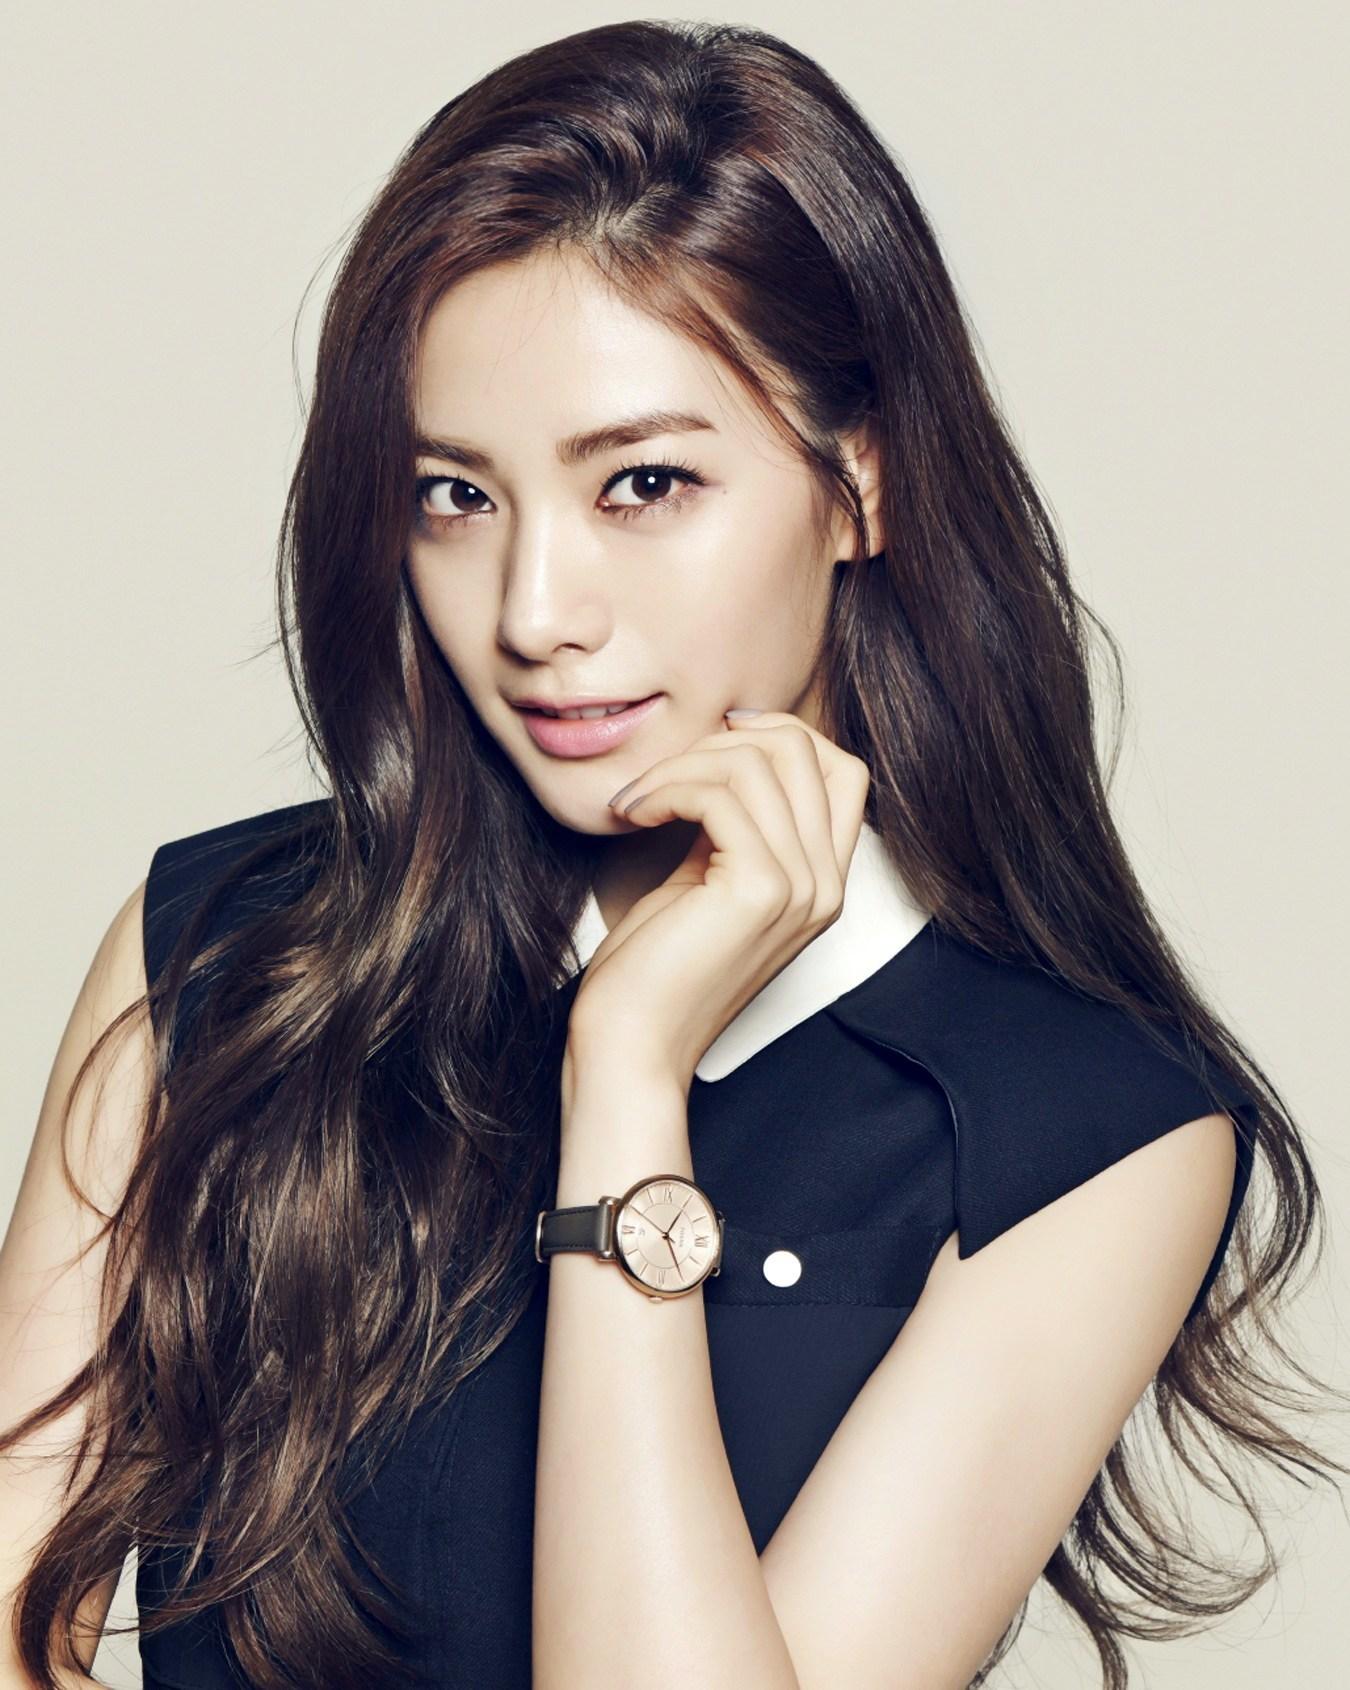 Nana (singer) - age: 29